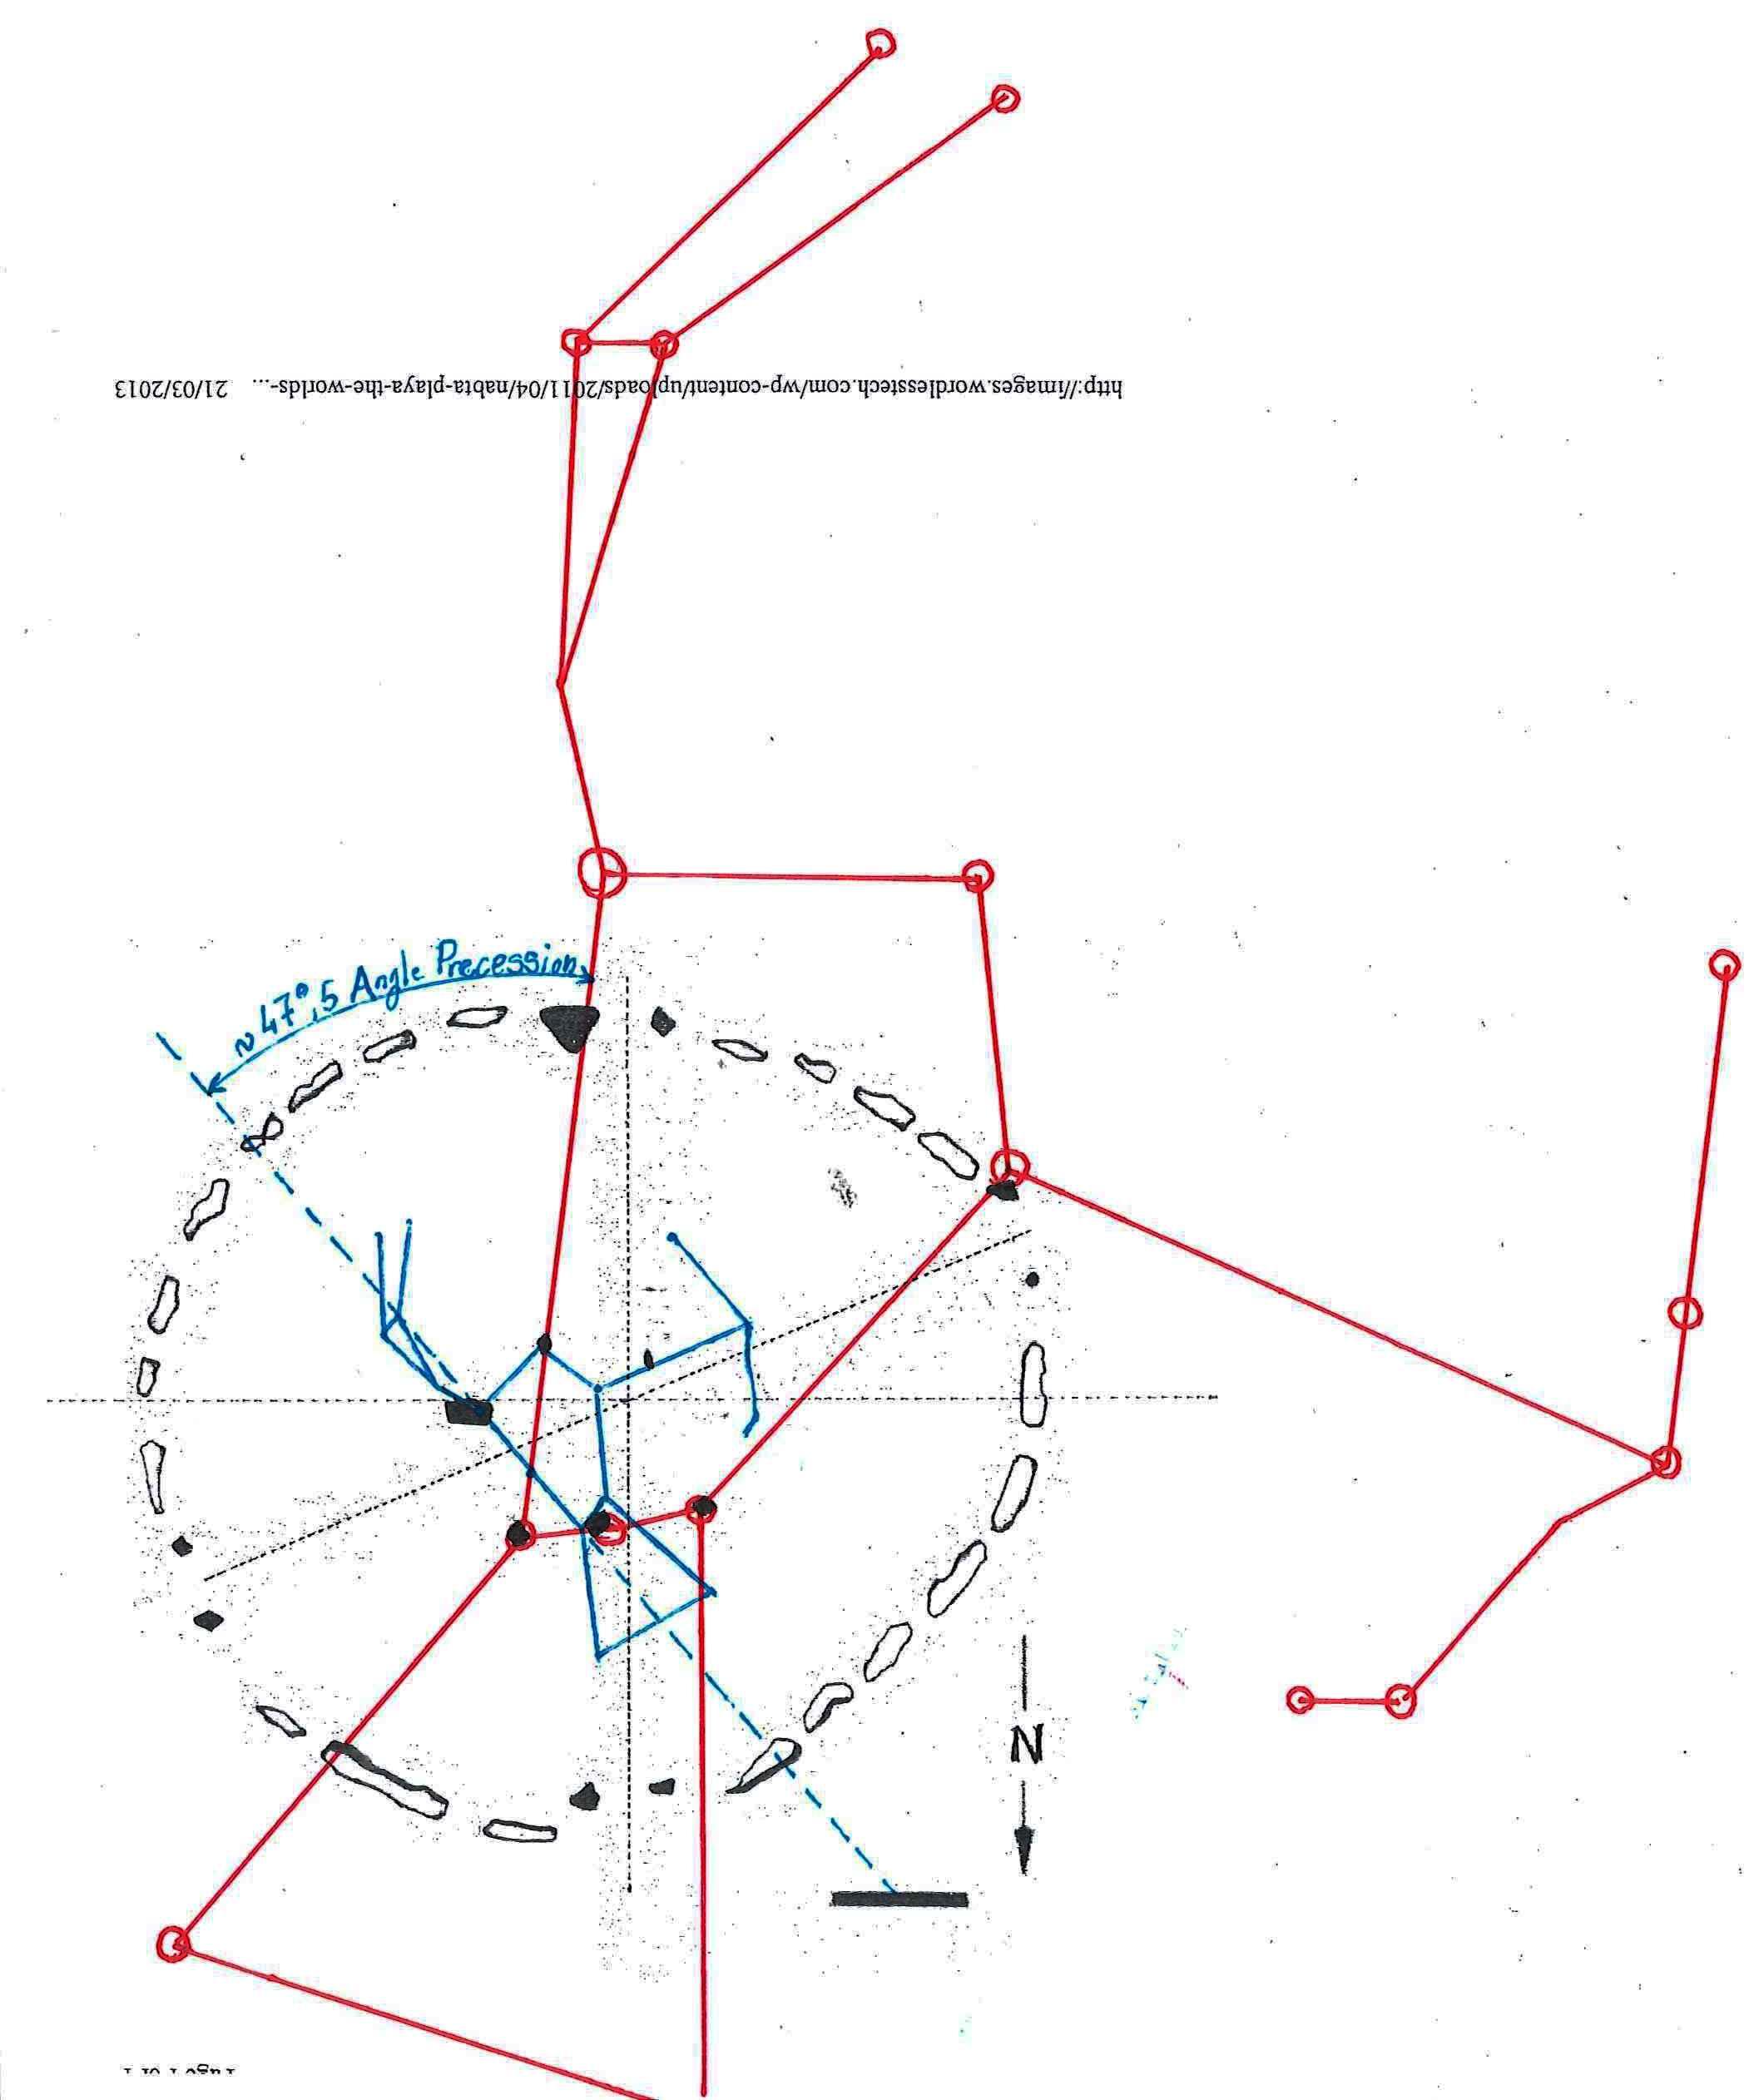 C:\Users\Utente\Pictures\1. Nuovo Articolo Antika English Version Tanghi Lontani\Antika English Version\gallery con aggiunte\precession\Precession Cycle into the Nabta Playa Stone Circle 1.jpg